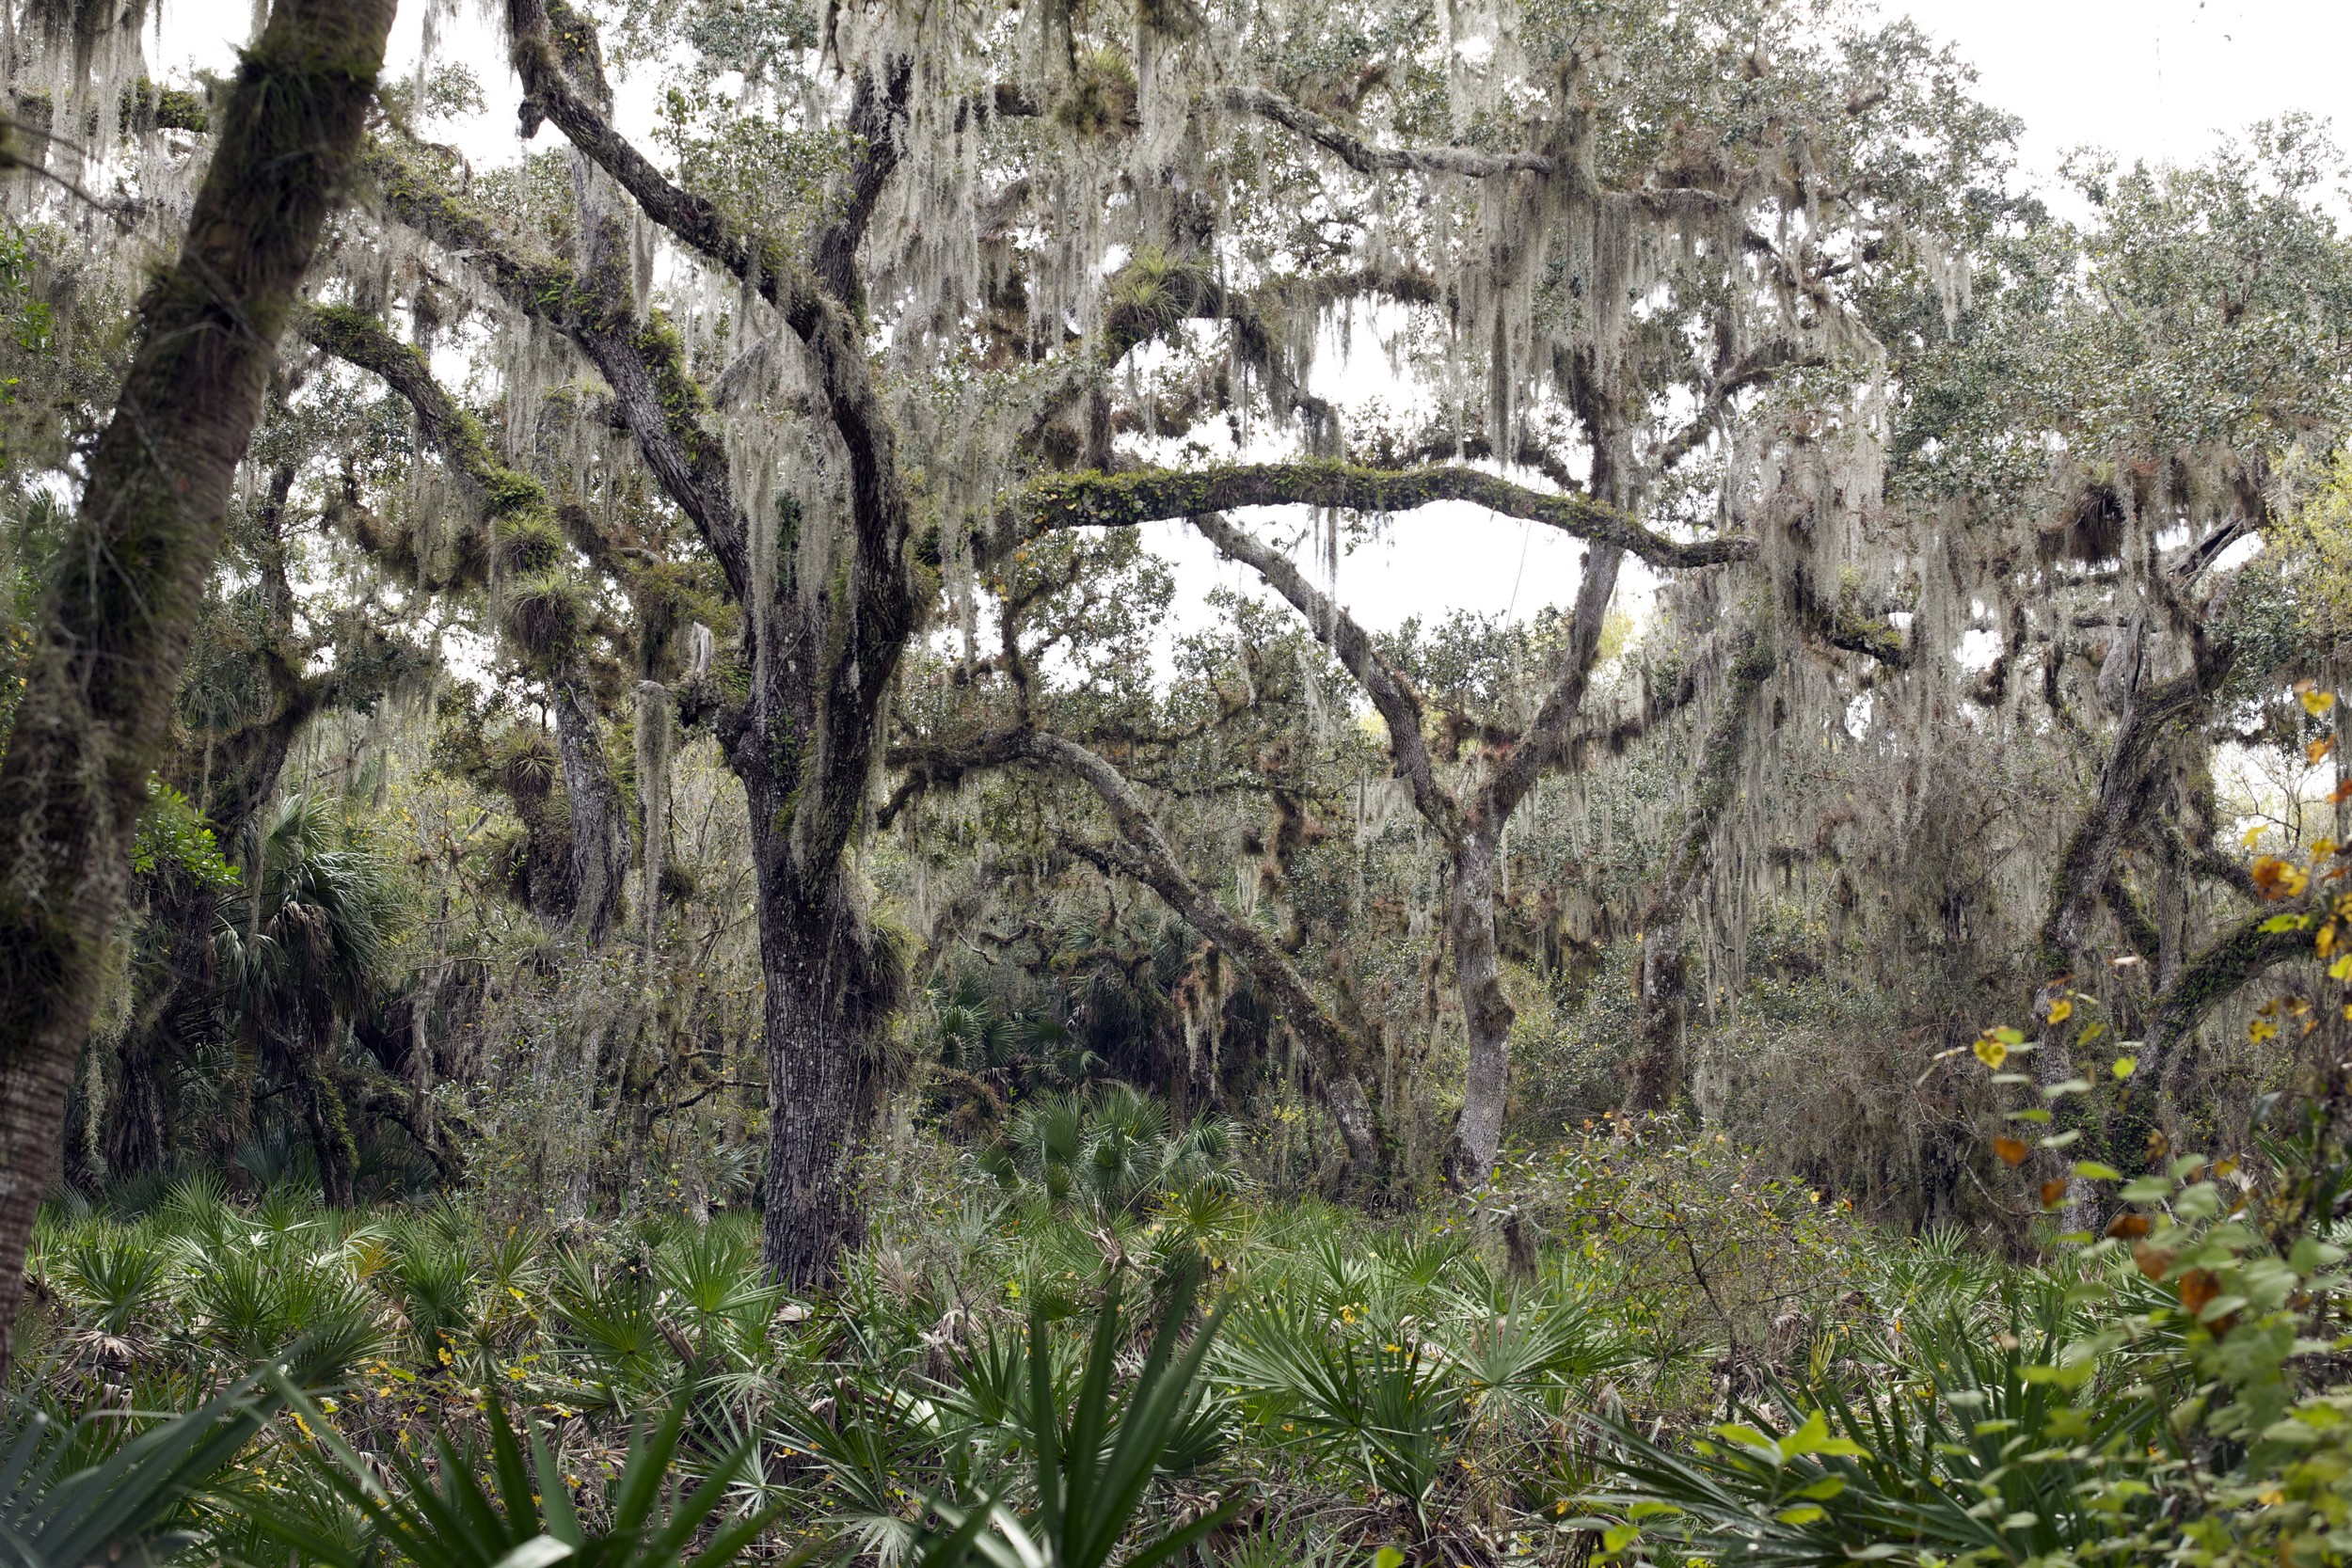 Myakka State Park, Florida L. A. Lewin 2013